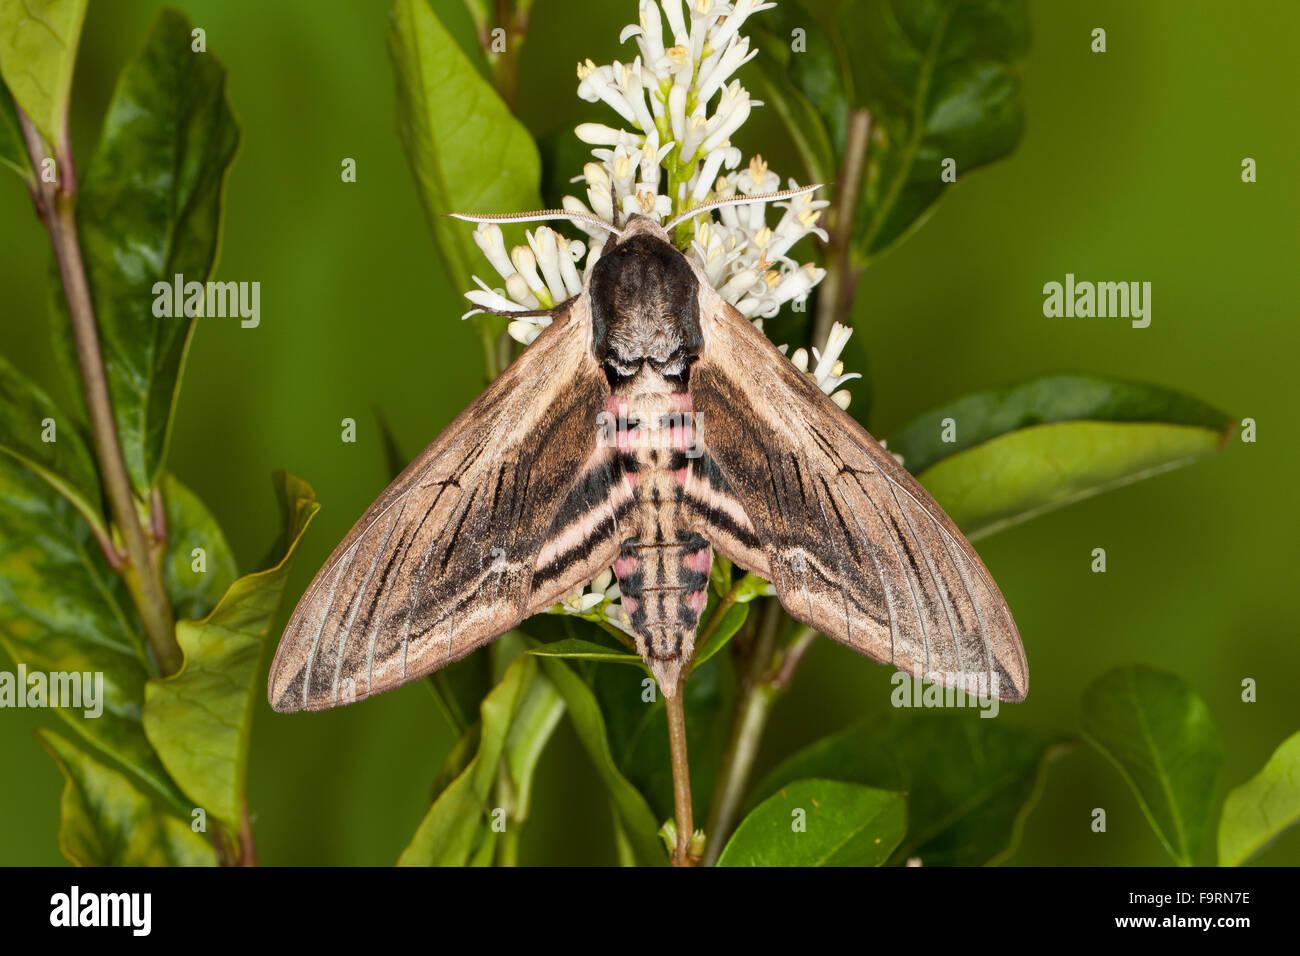 Privet hawk moth - photo#42